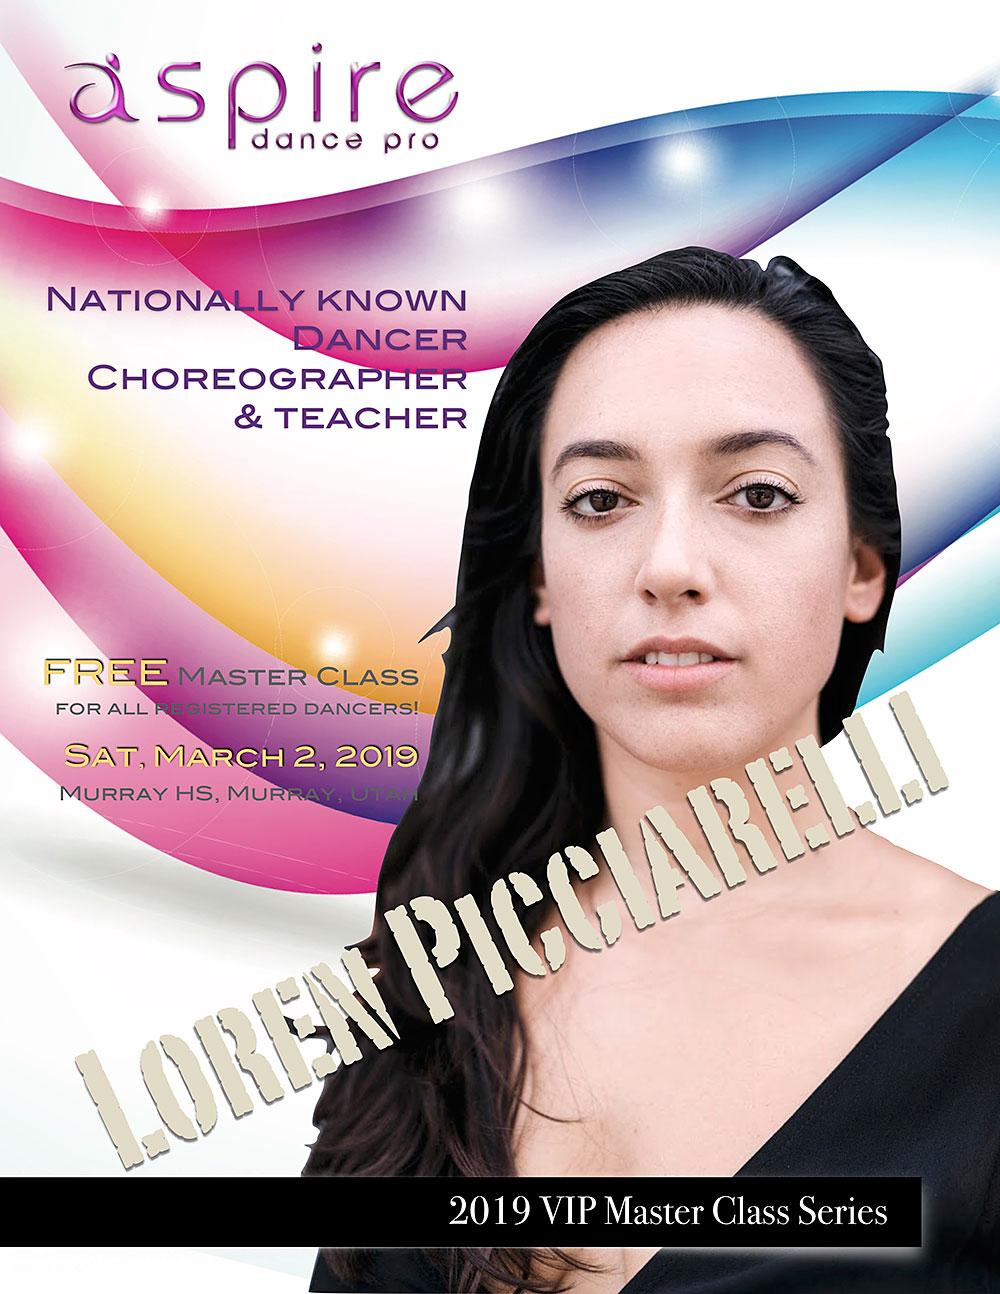 Loren Picciarelli - Aspire 2019 Master Class Series